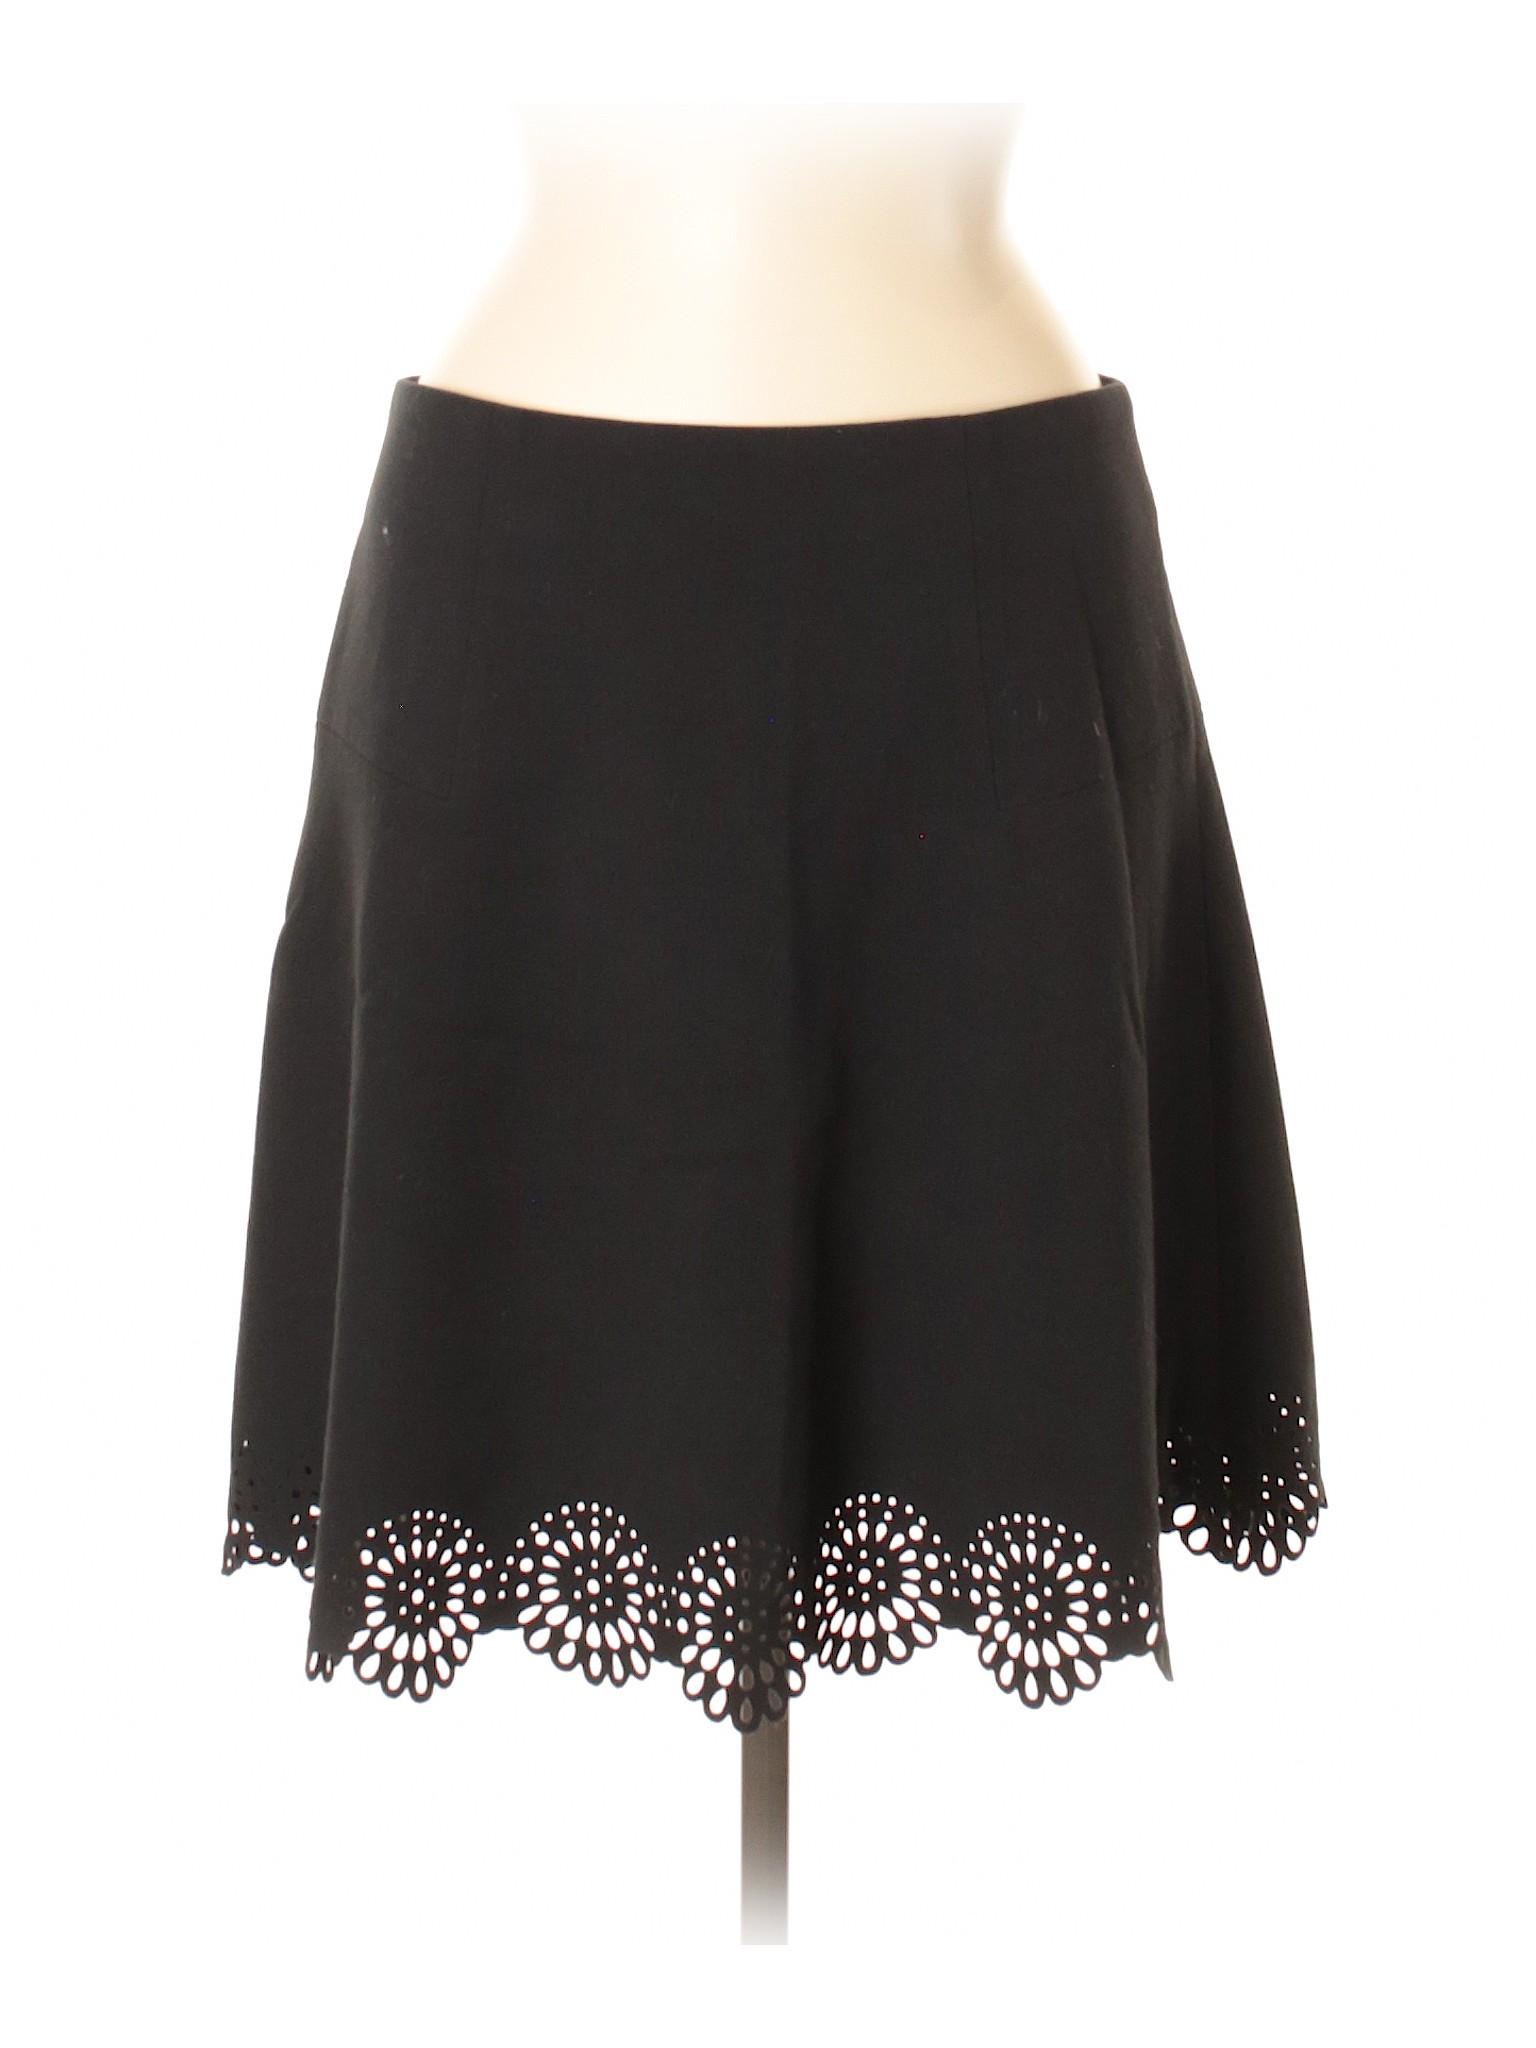 Leisure Ann Casual LOFT winter Skirt Taylor aRaSpB